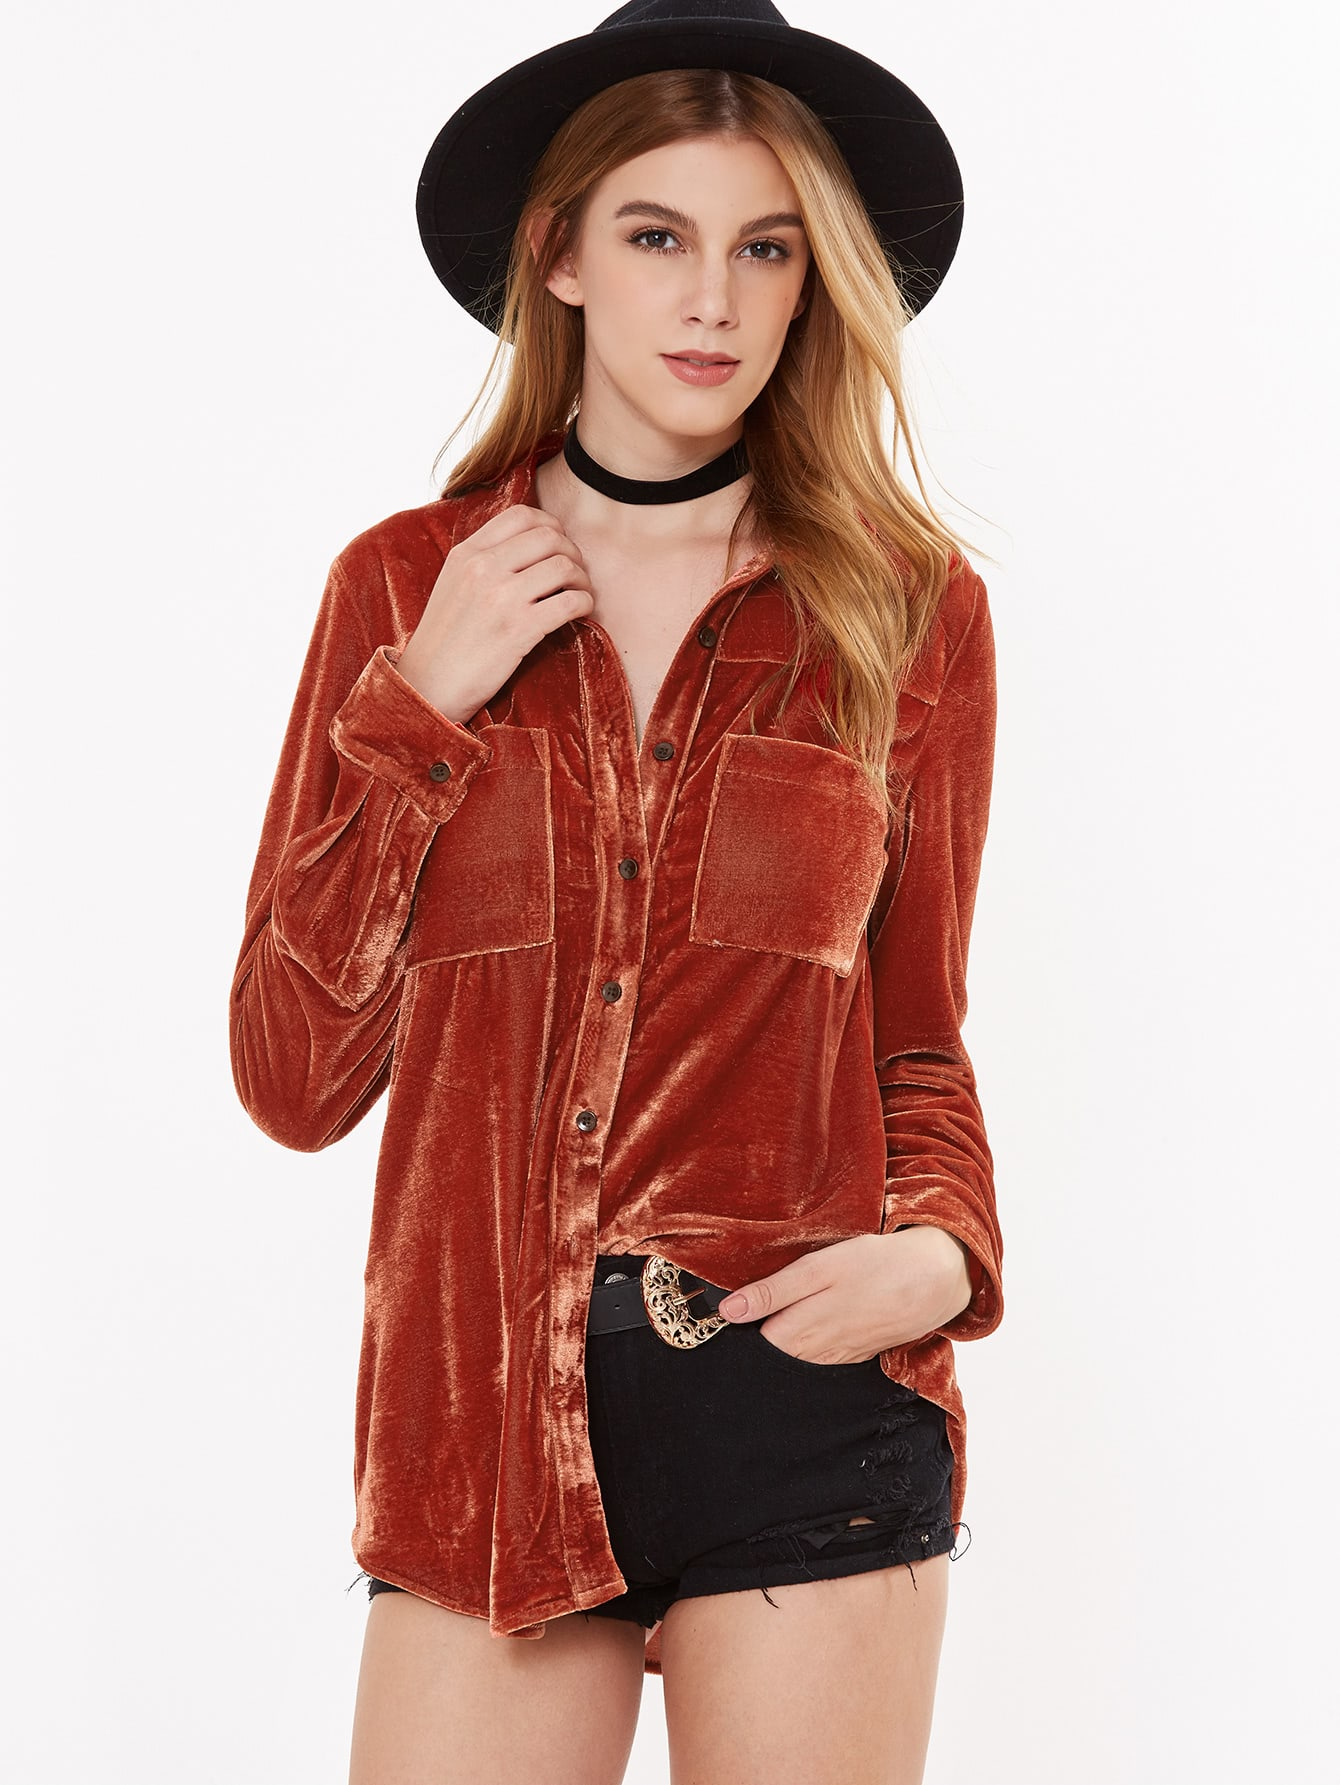 blouse160923703_2